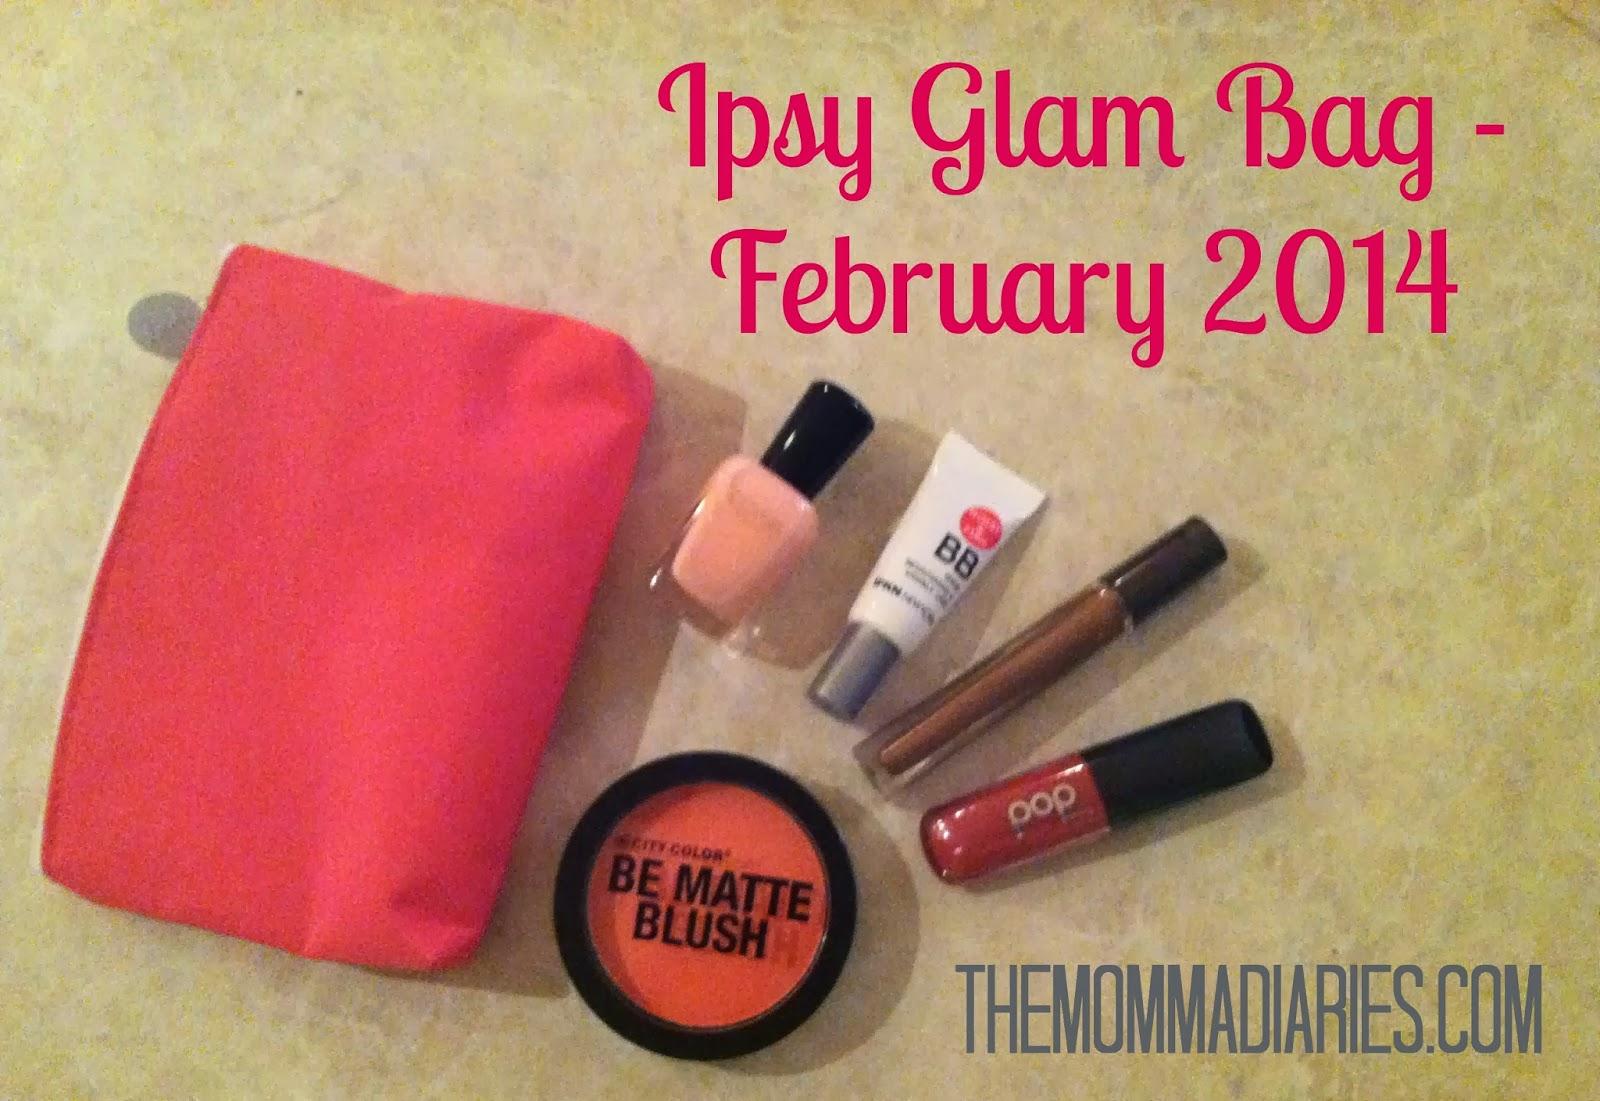 Ipsy Glam Bag February 2014